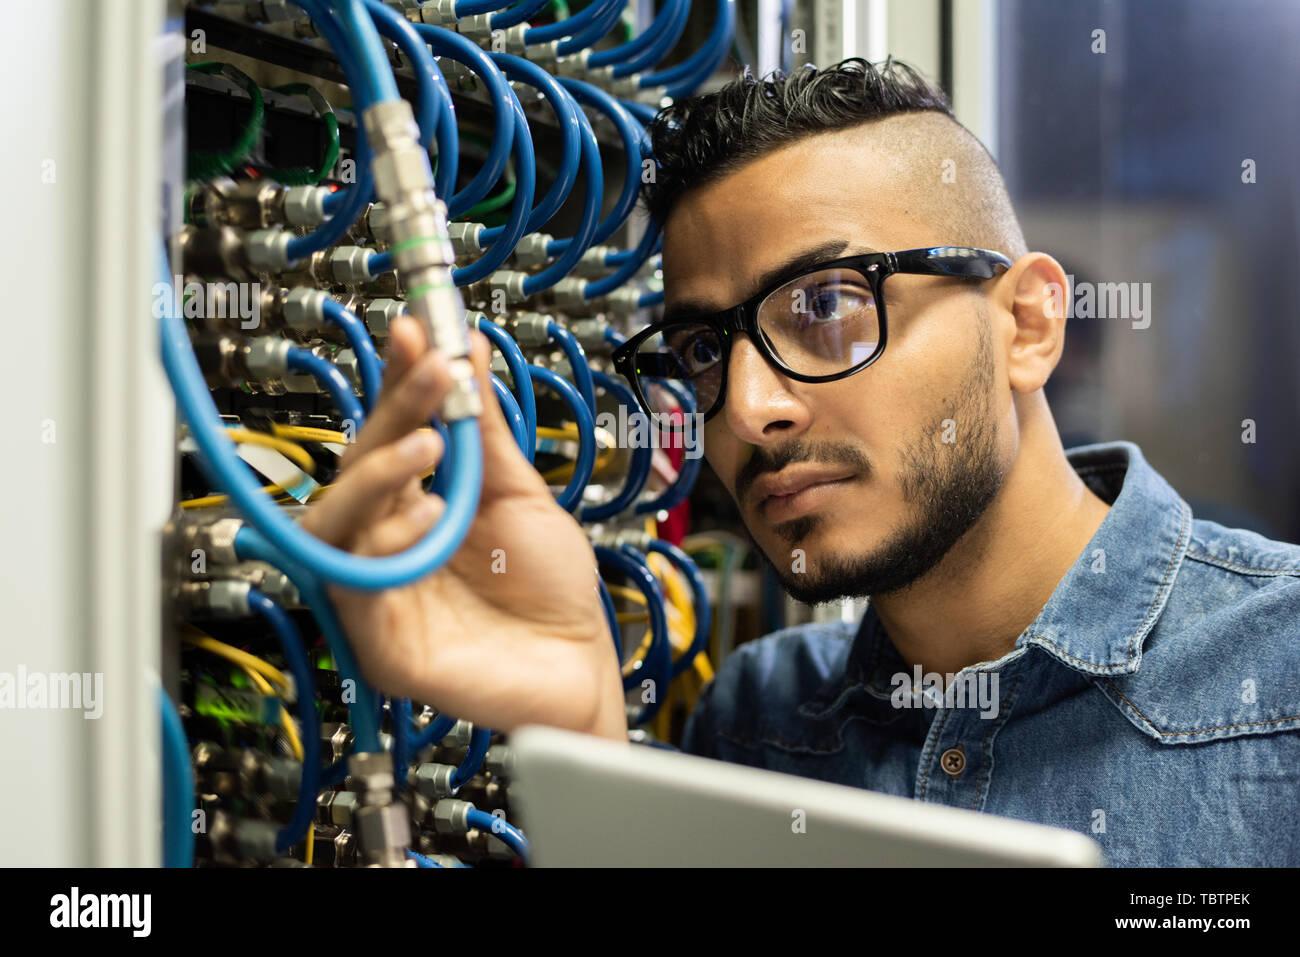 Technical engineer examining mainframe computer - Stock Image